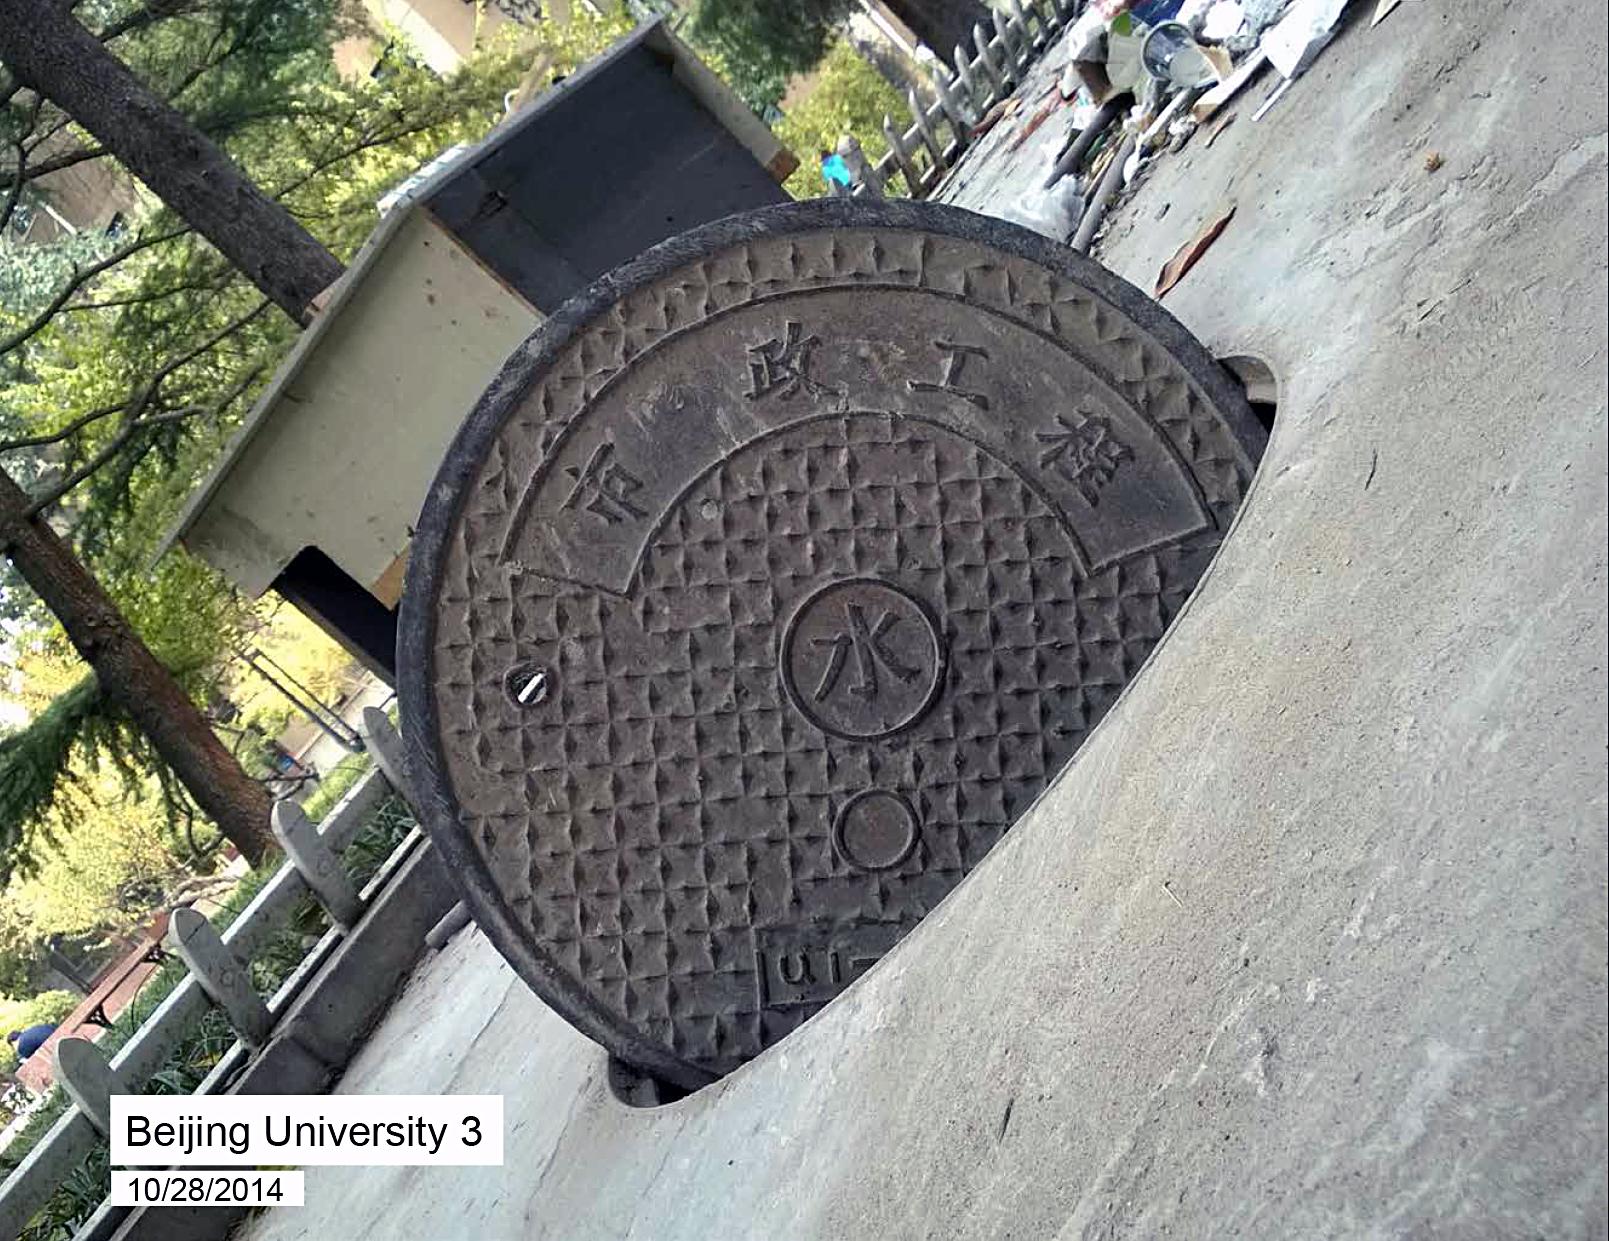 Manhole_Zoom_1.png